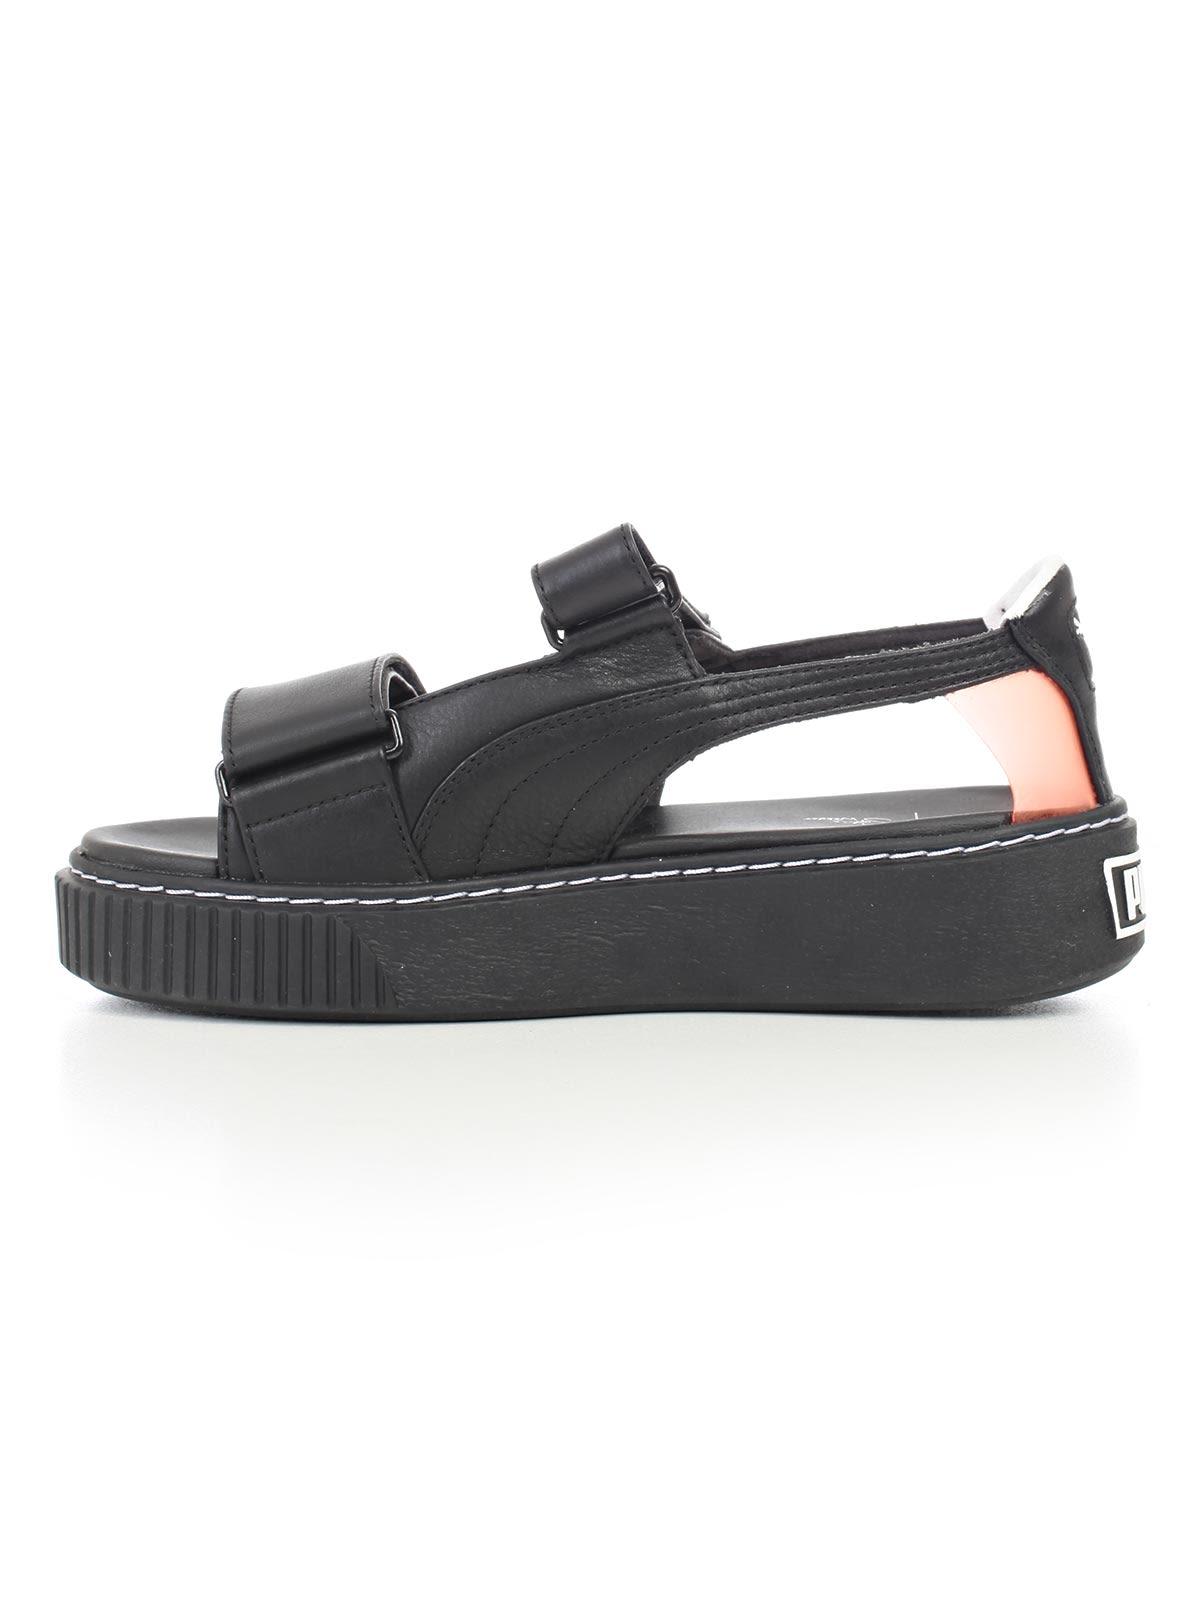 Sophia Webster X Puma Sneakers